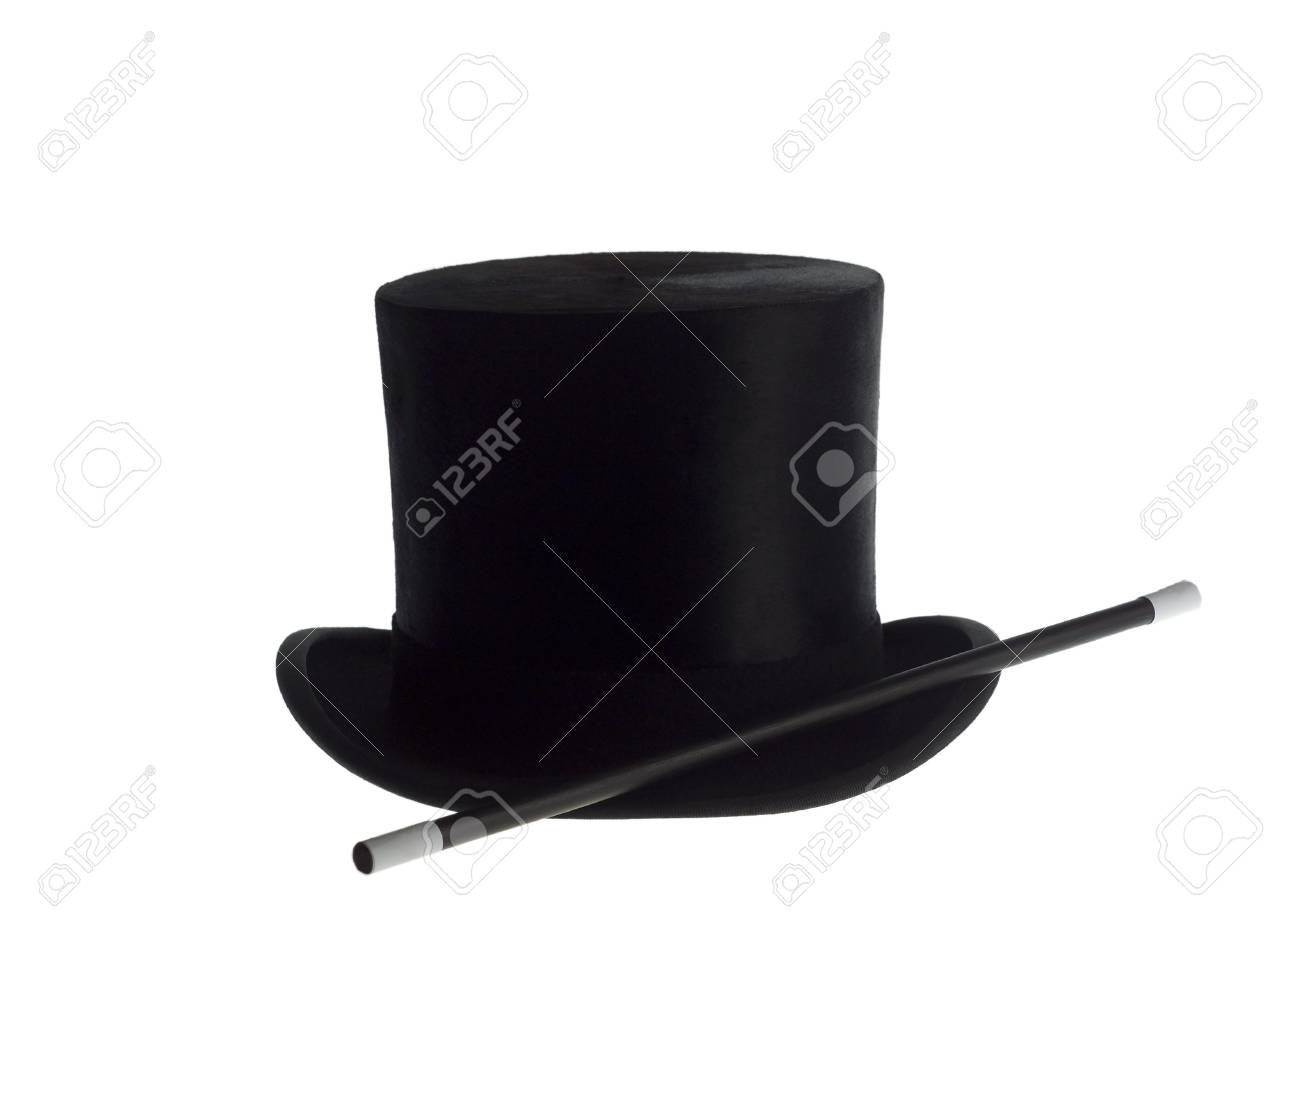 Magic Equipment isolated on white background Stock Photo - 12600748